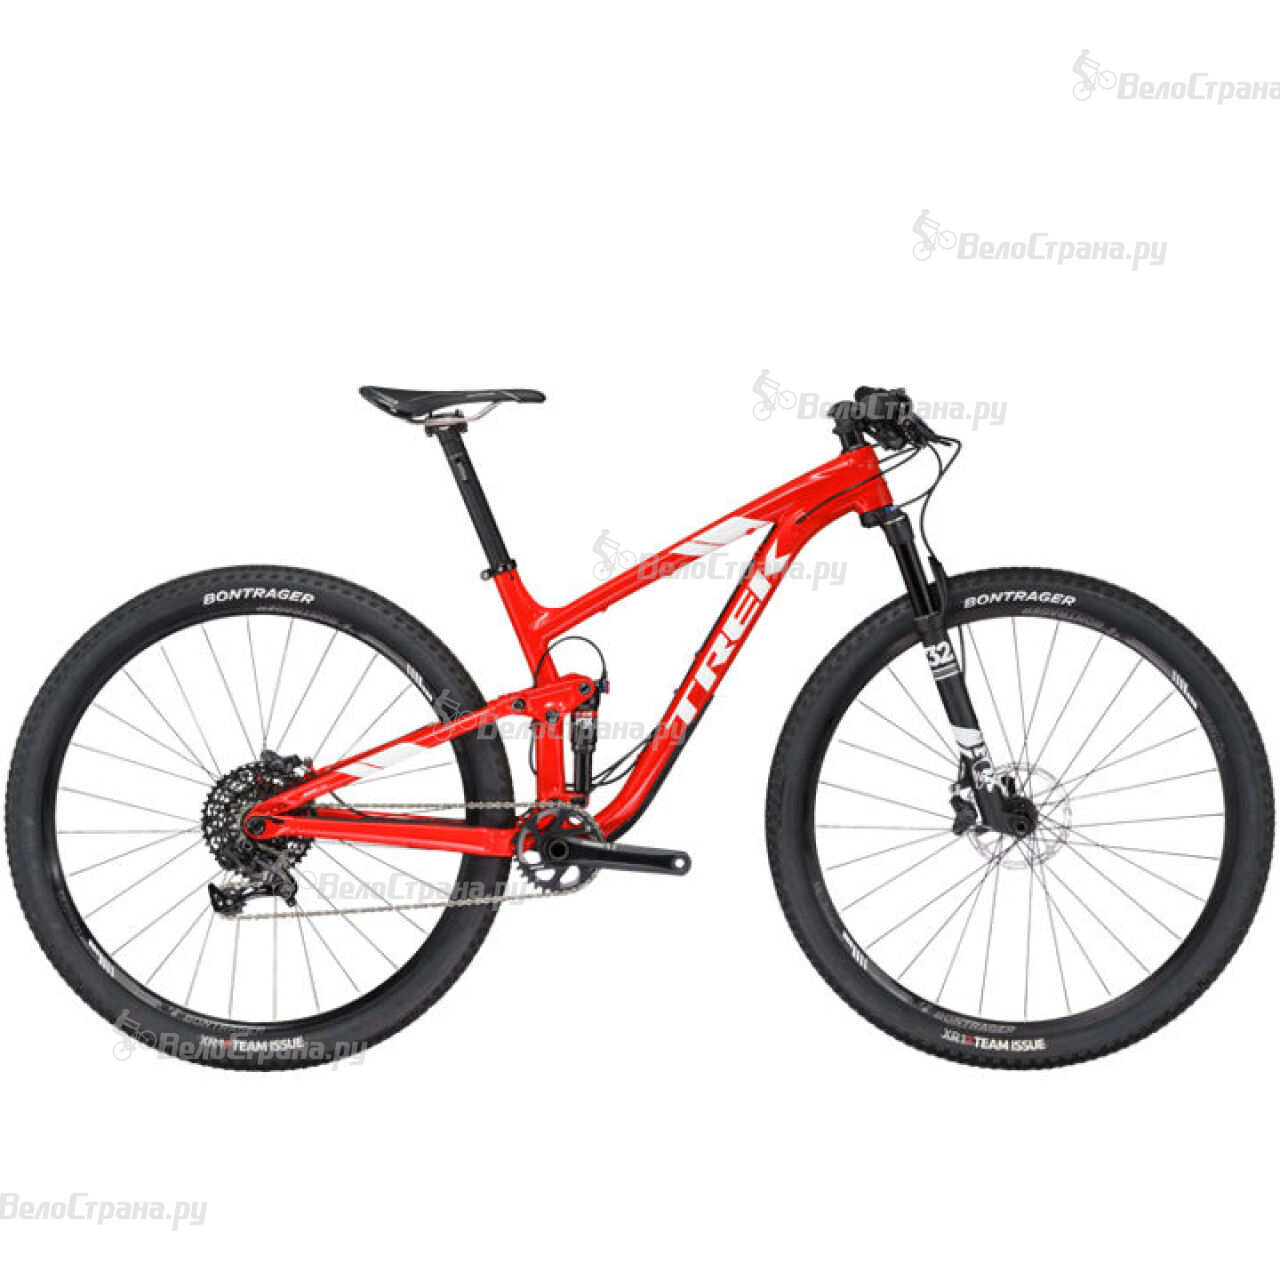 Велосипед Trek Top Fuel 9 (2017) велосипед trek fuel ex 9 29 2017